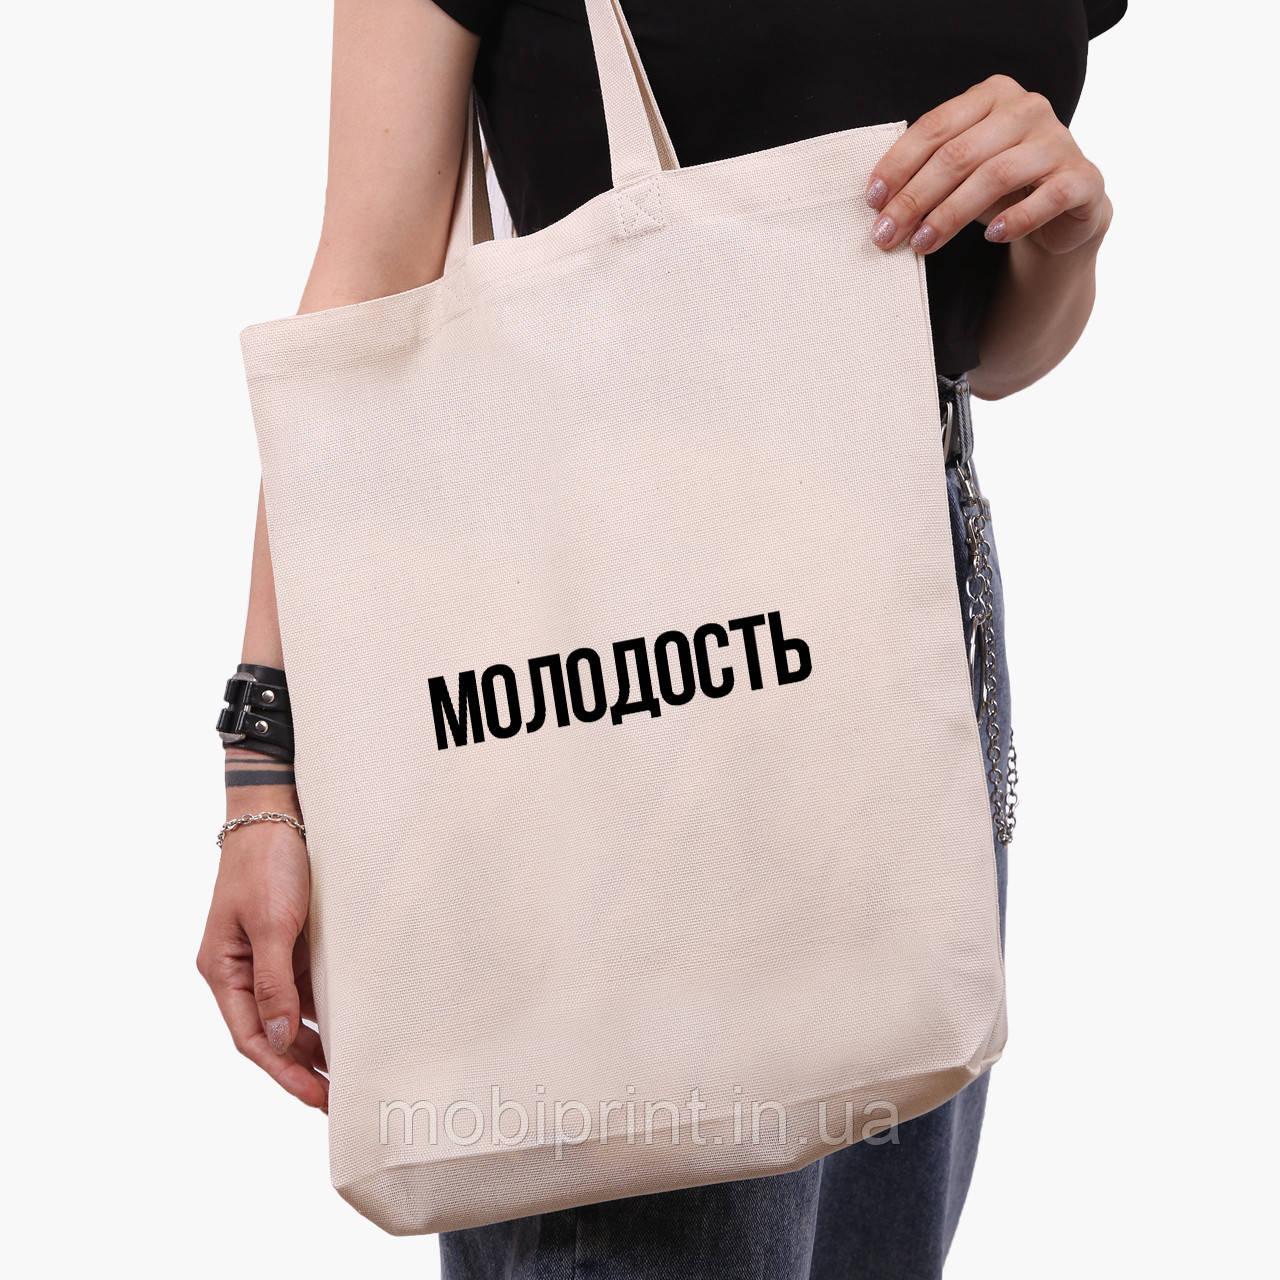 Эко сумка шоппер белая Молодость (Youth) (9227-1281-1)  экосумка шопер 41*39*8 см